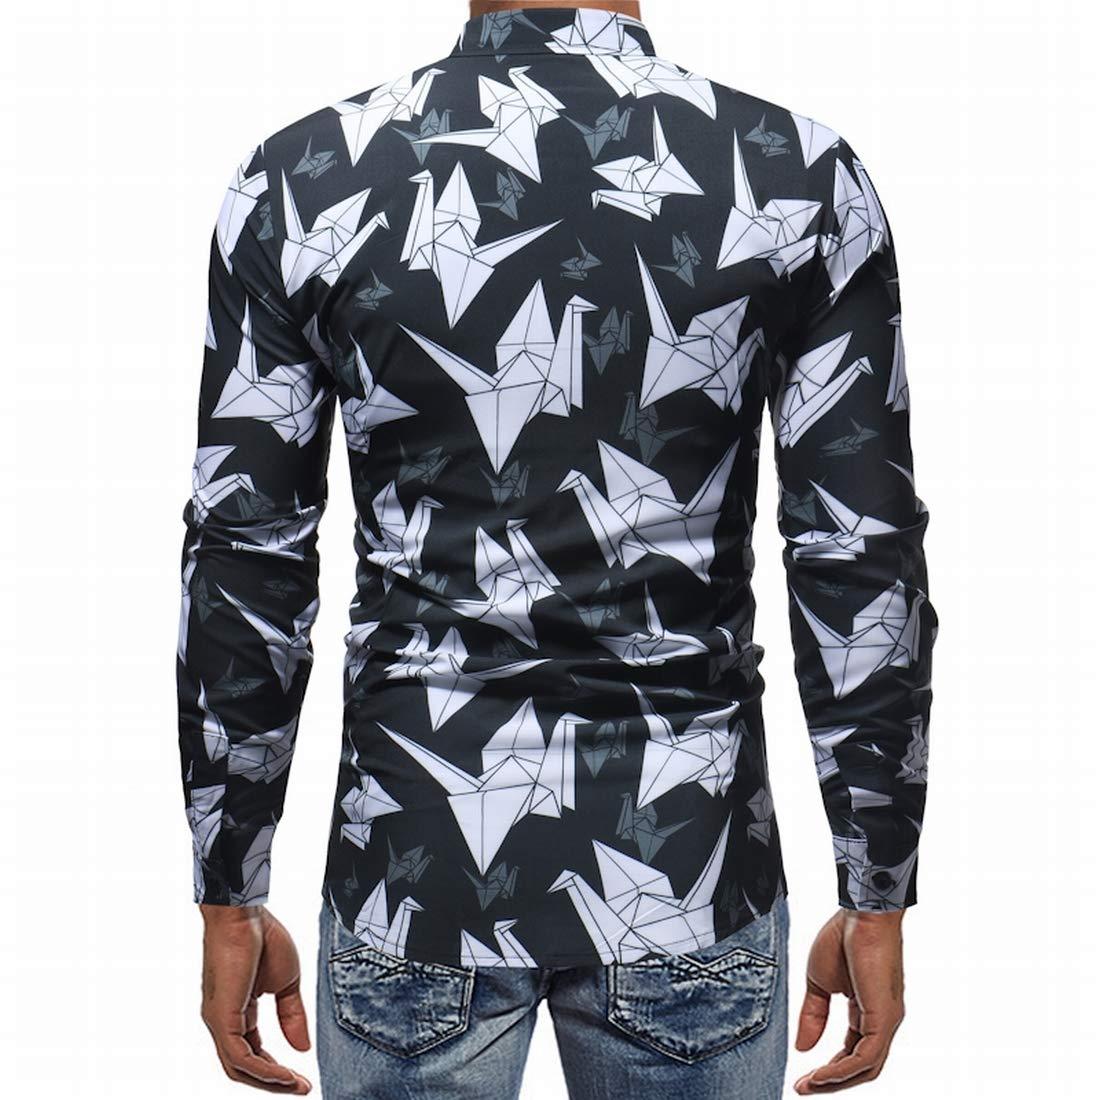 Nanquan Men Vintage Crane Print Long Sleeve Slim Fit Casual Shirt